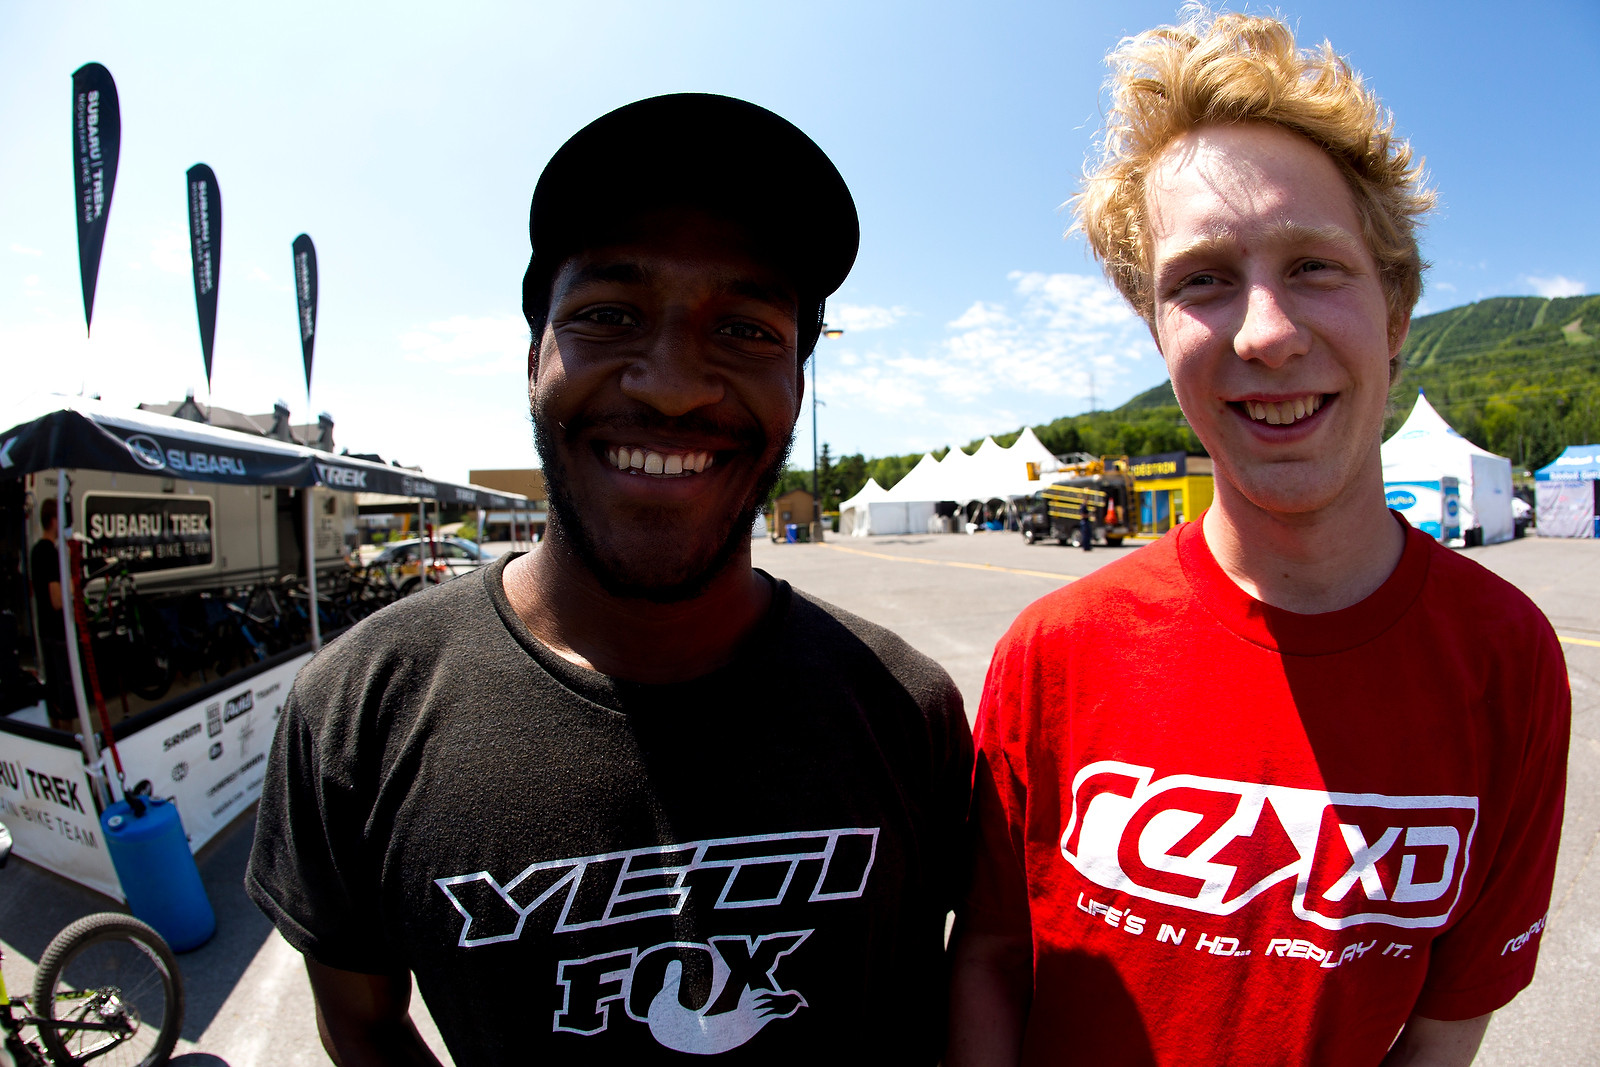 Eliot Jackson and Bernard Kerr at MSA - 2012 UCI World Cup, Mont Sainte Anne, Day 1 - Mountain Biking Pictures - Vital MTB